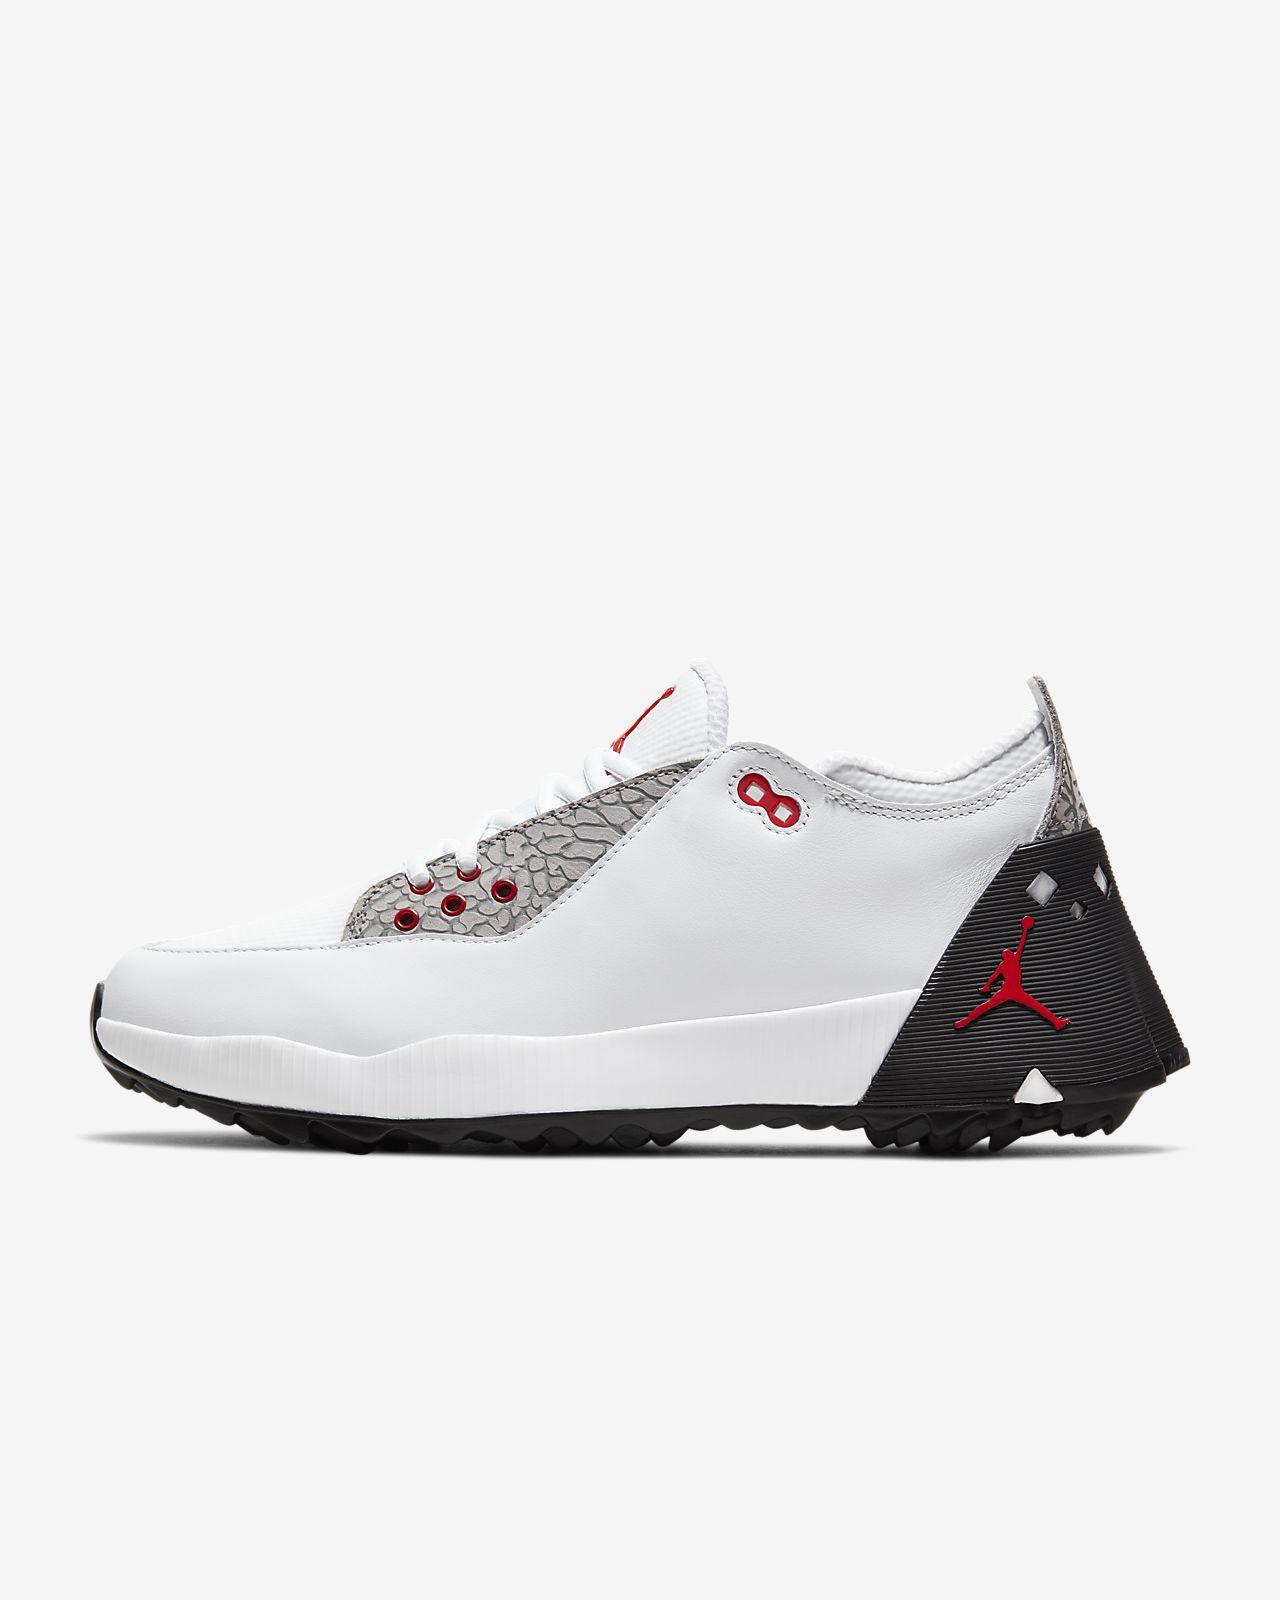 Męskie buty do golfa Jordan ADG 2